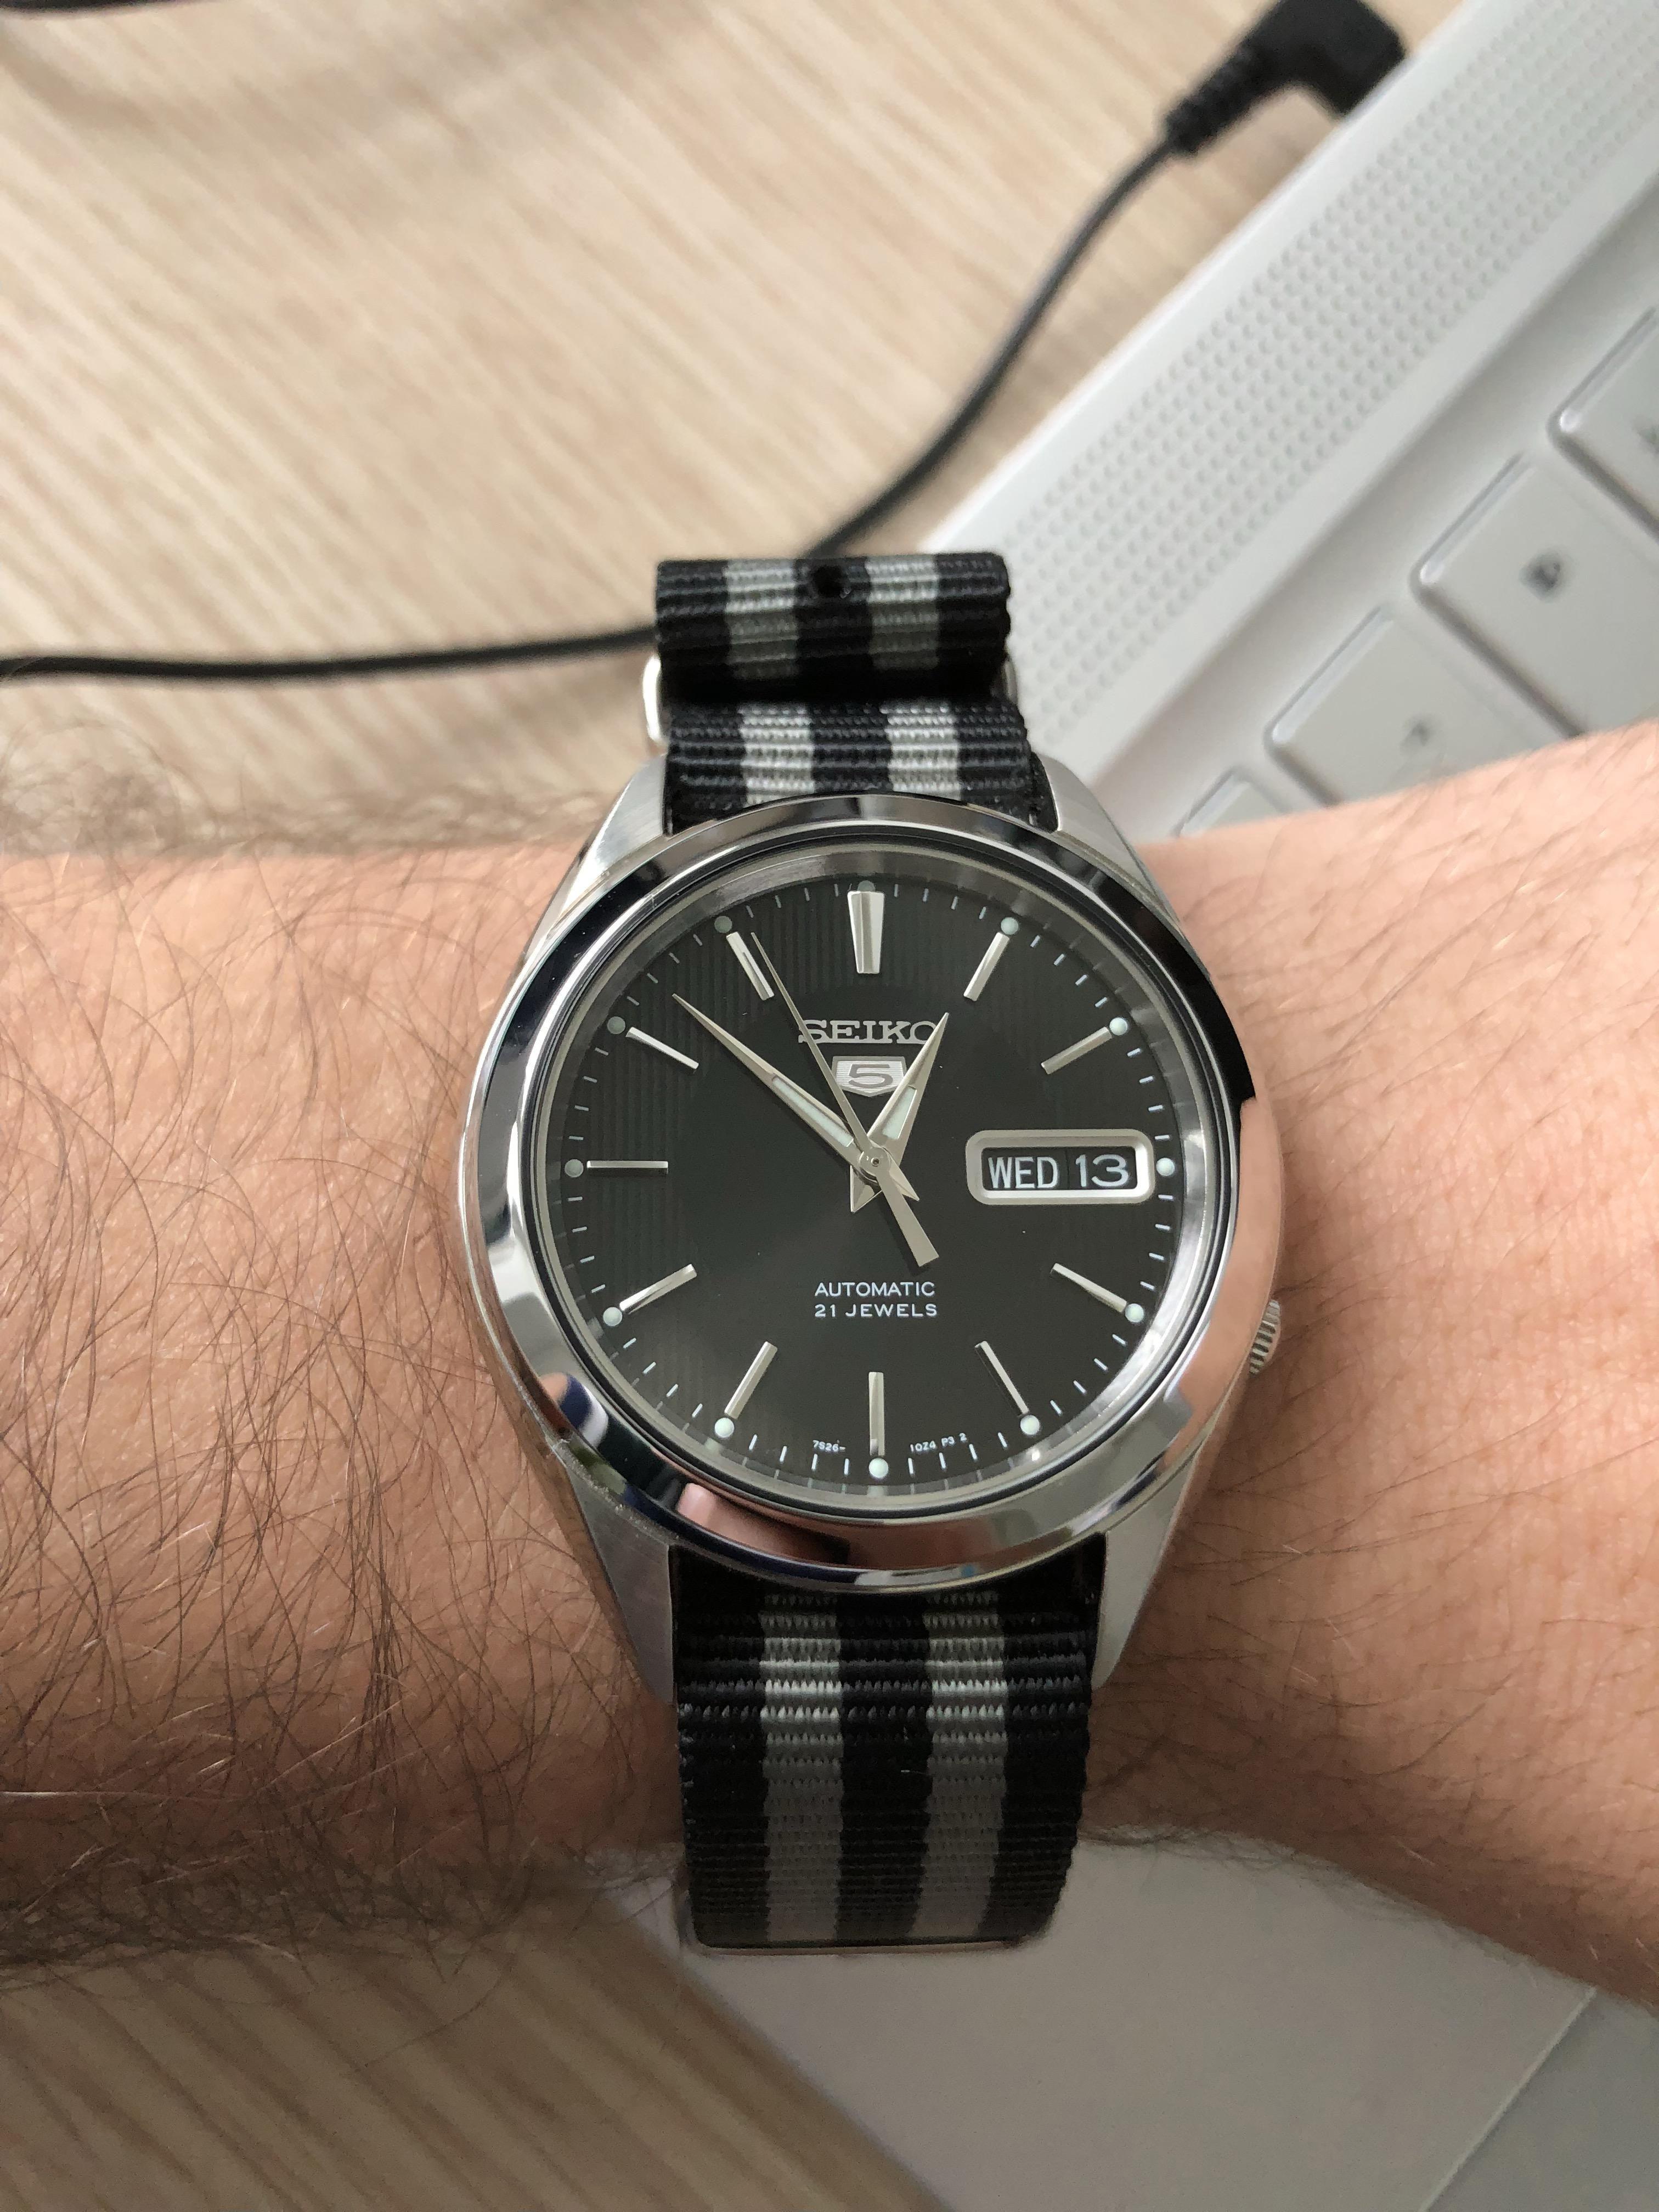 Seiko 5 Snkl23 My Second Automatic Watch Watches Seiko